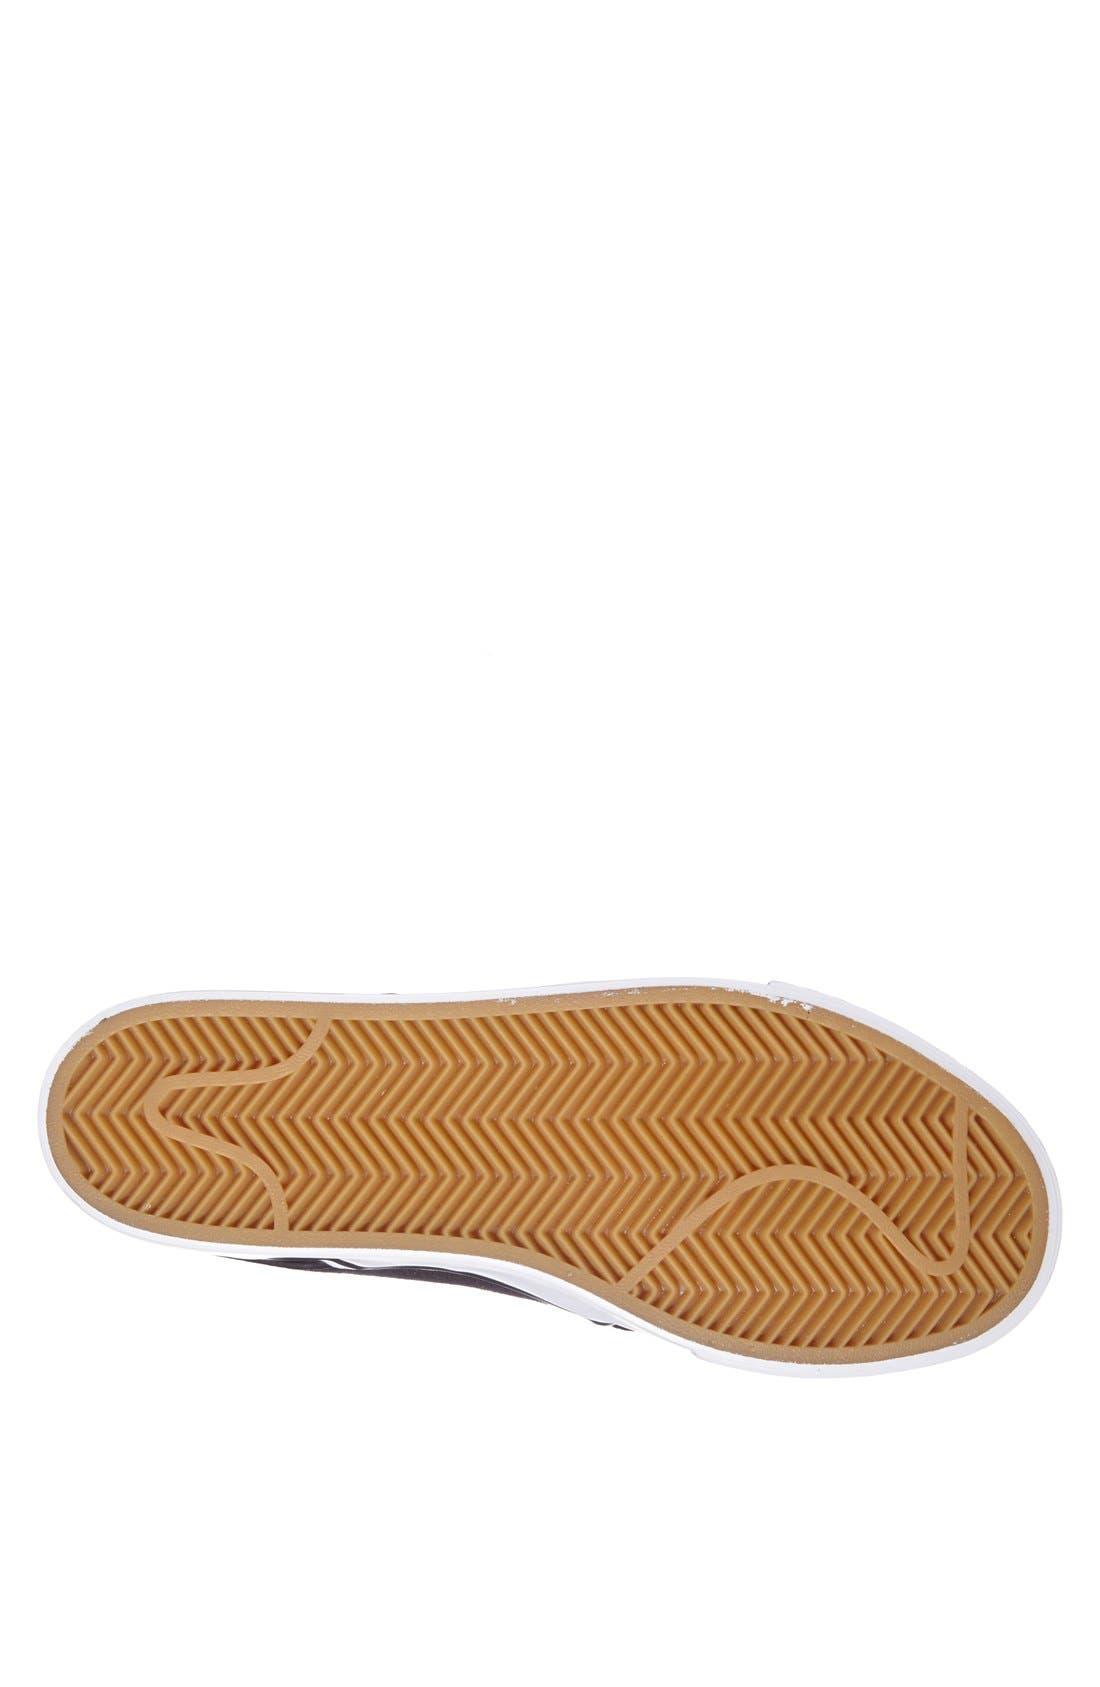 Zoom - Stefan Janoski SB Canvas Skate Shoe,                             Alternate thumbnail 143, color,